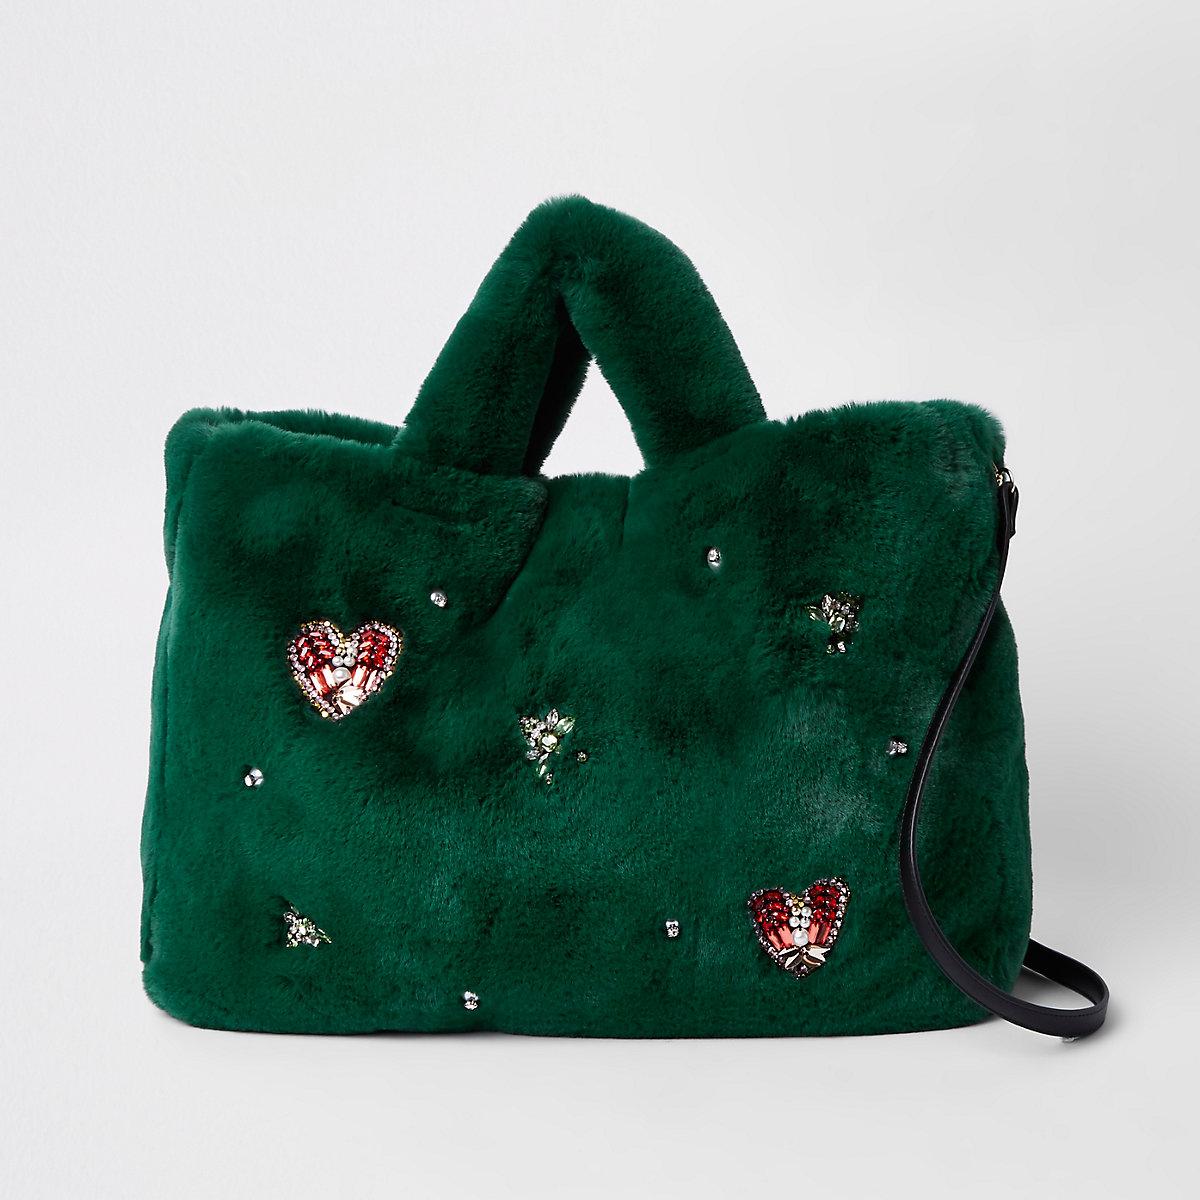 Green faux fur jewel embellished shopper